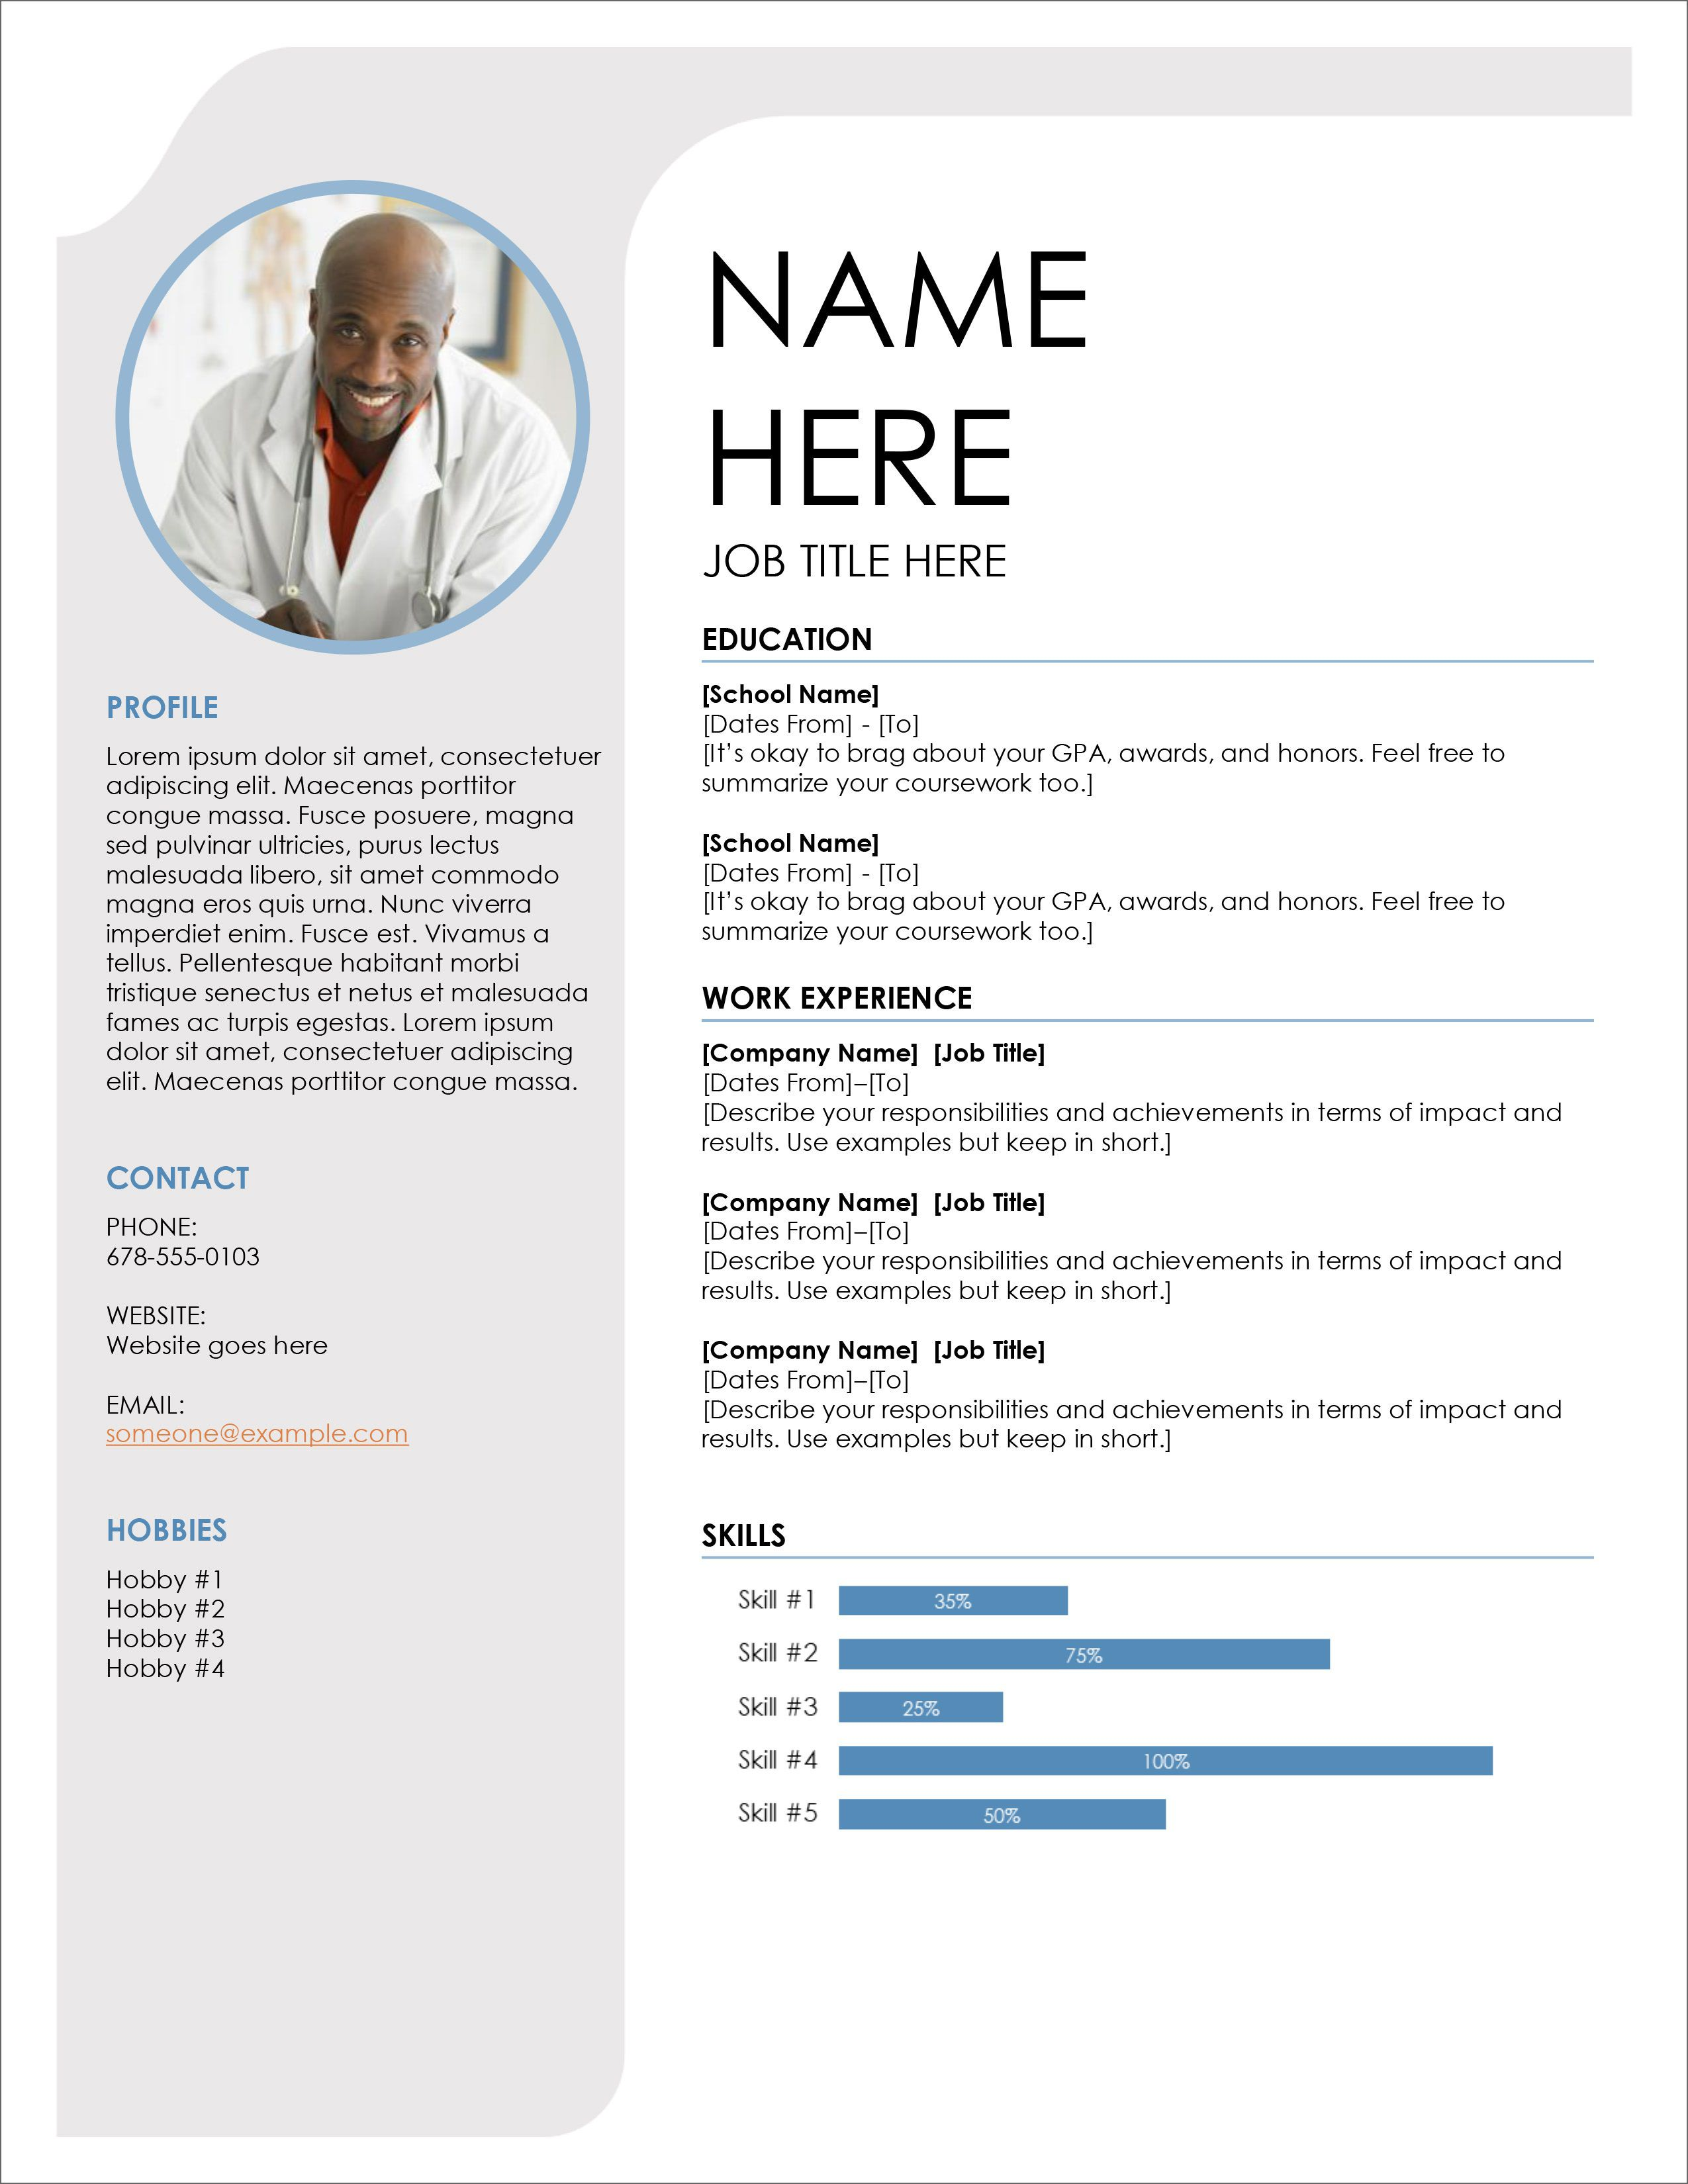 007 Impressive M Word Template Free Download Design  Microsoft Office Invoice Letterhead 2003 ResumeFull